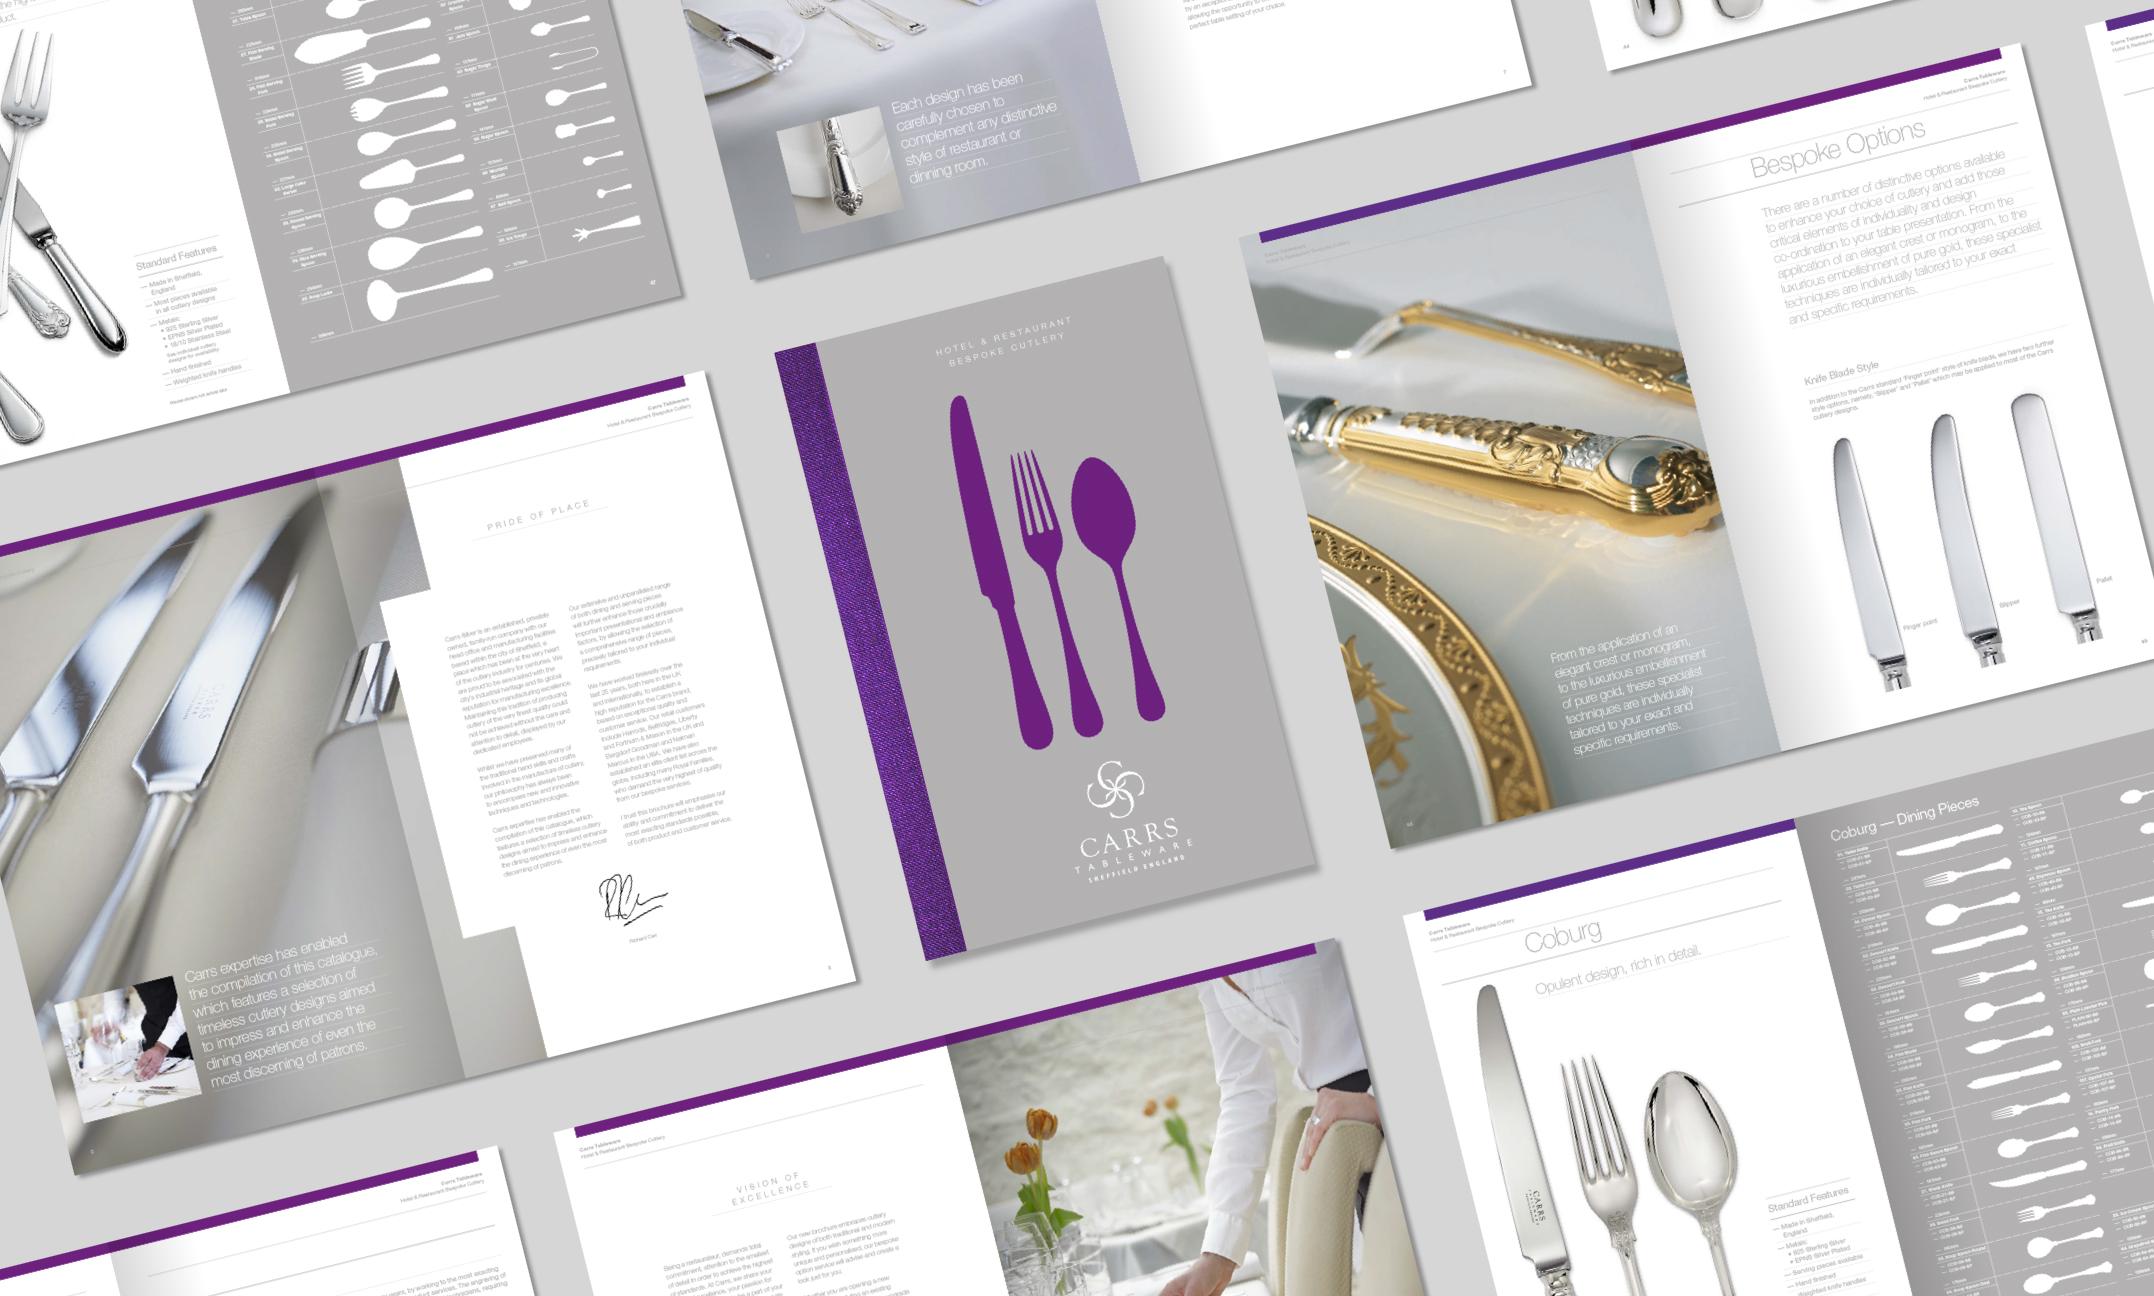 Carrs Silver brochures